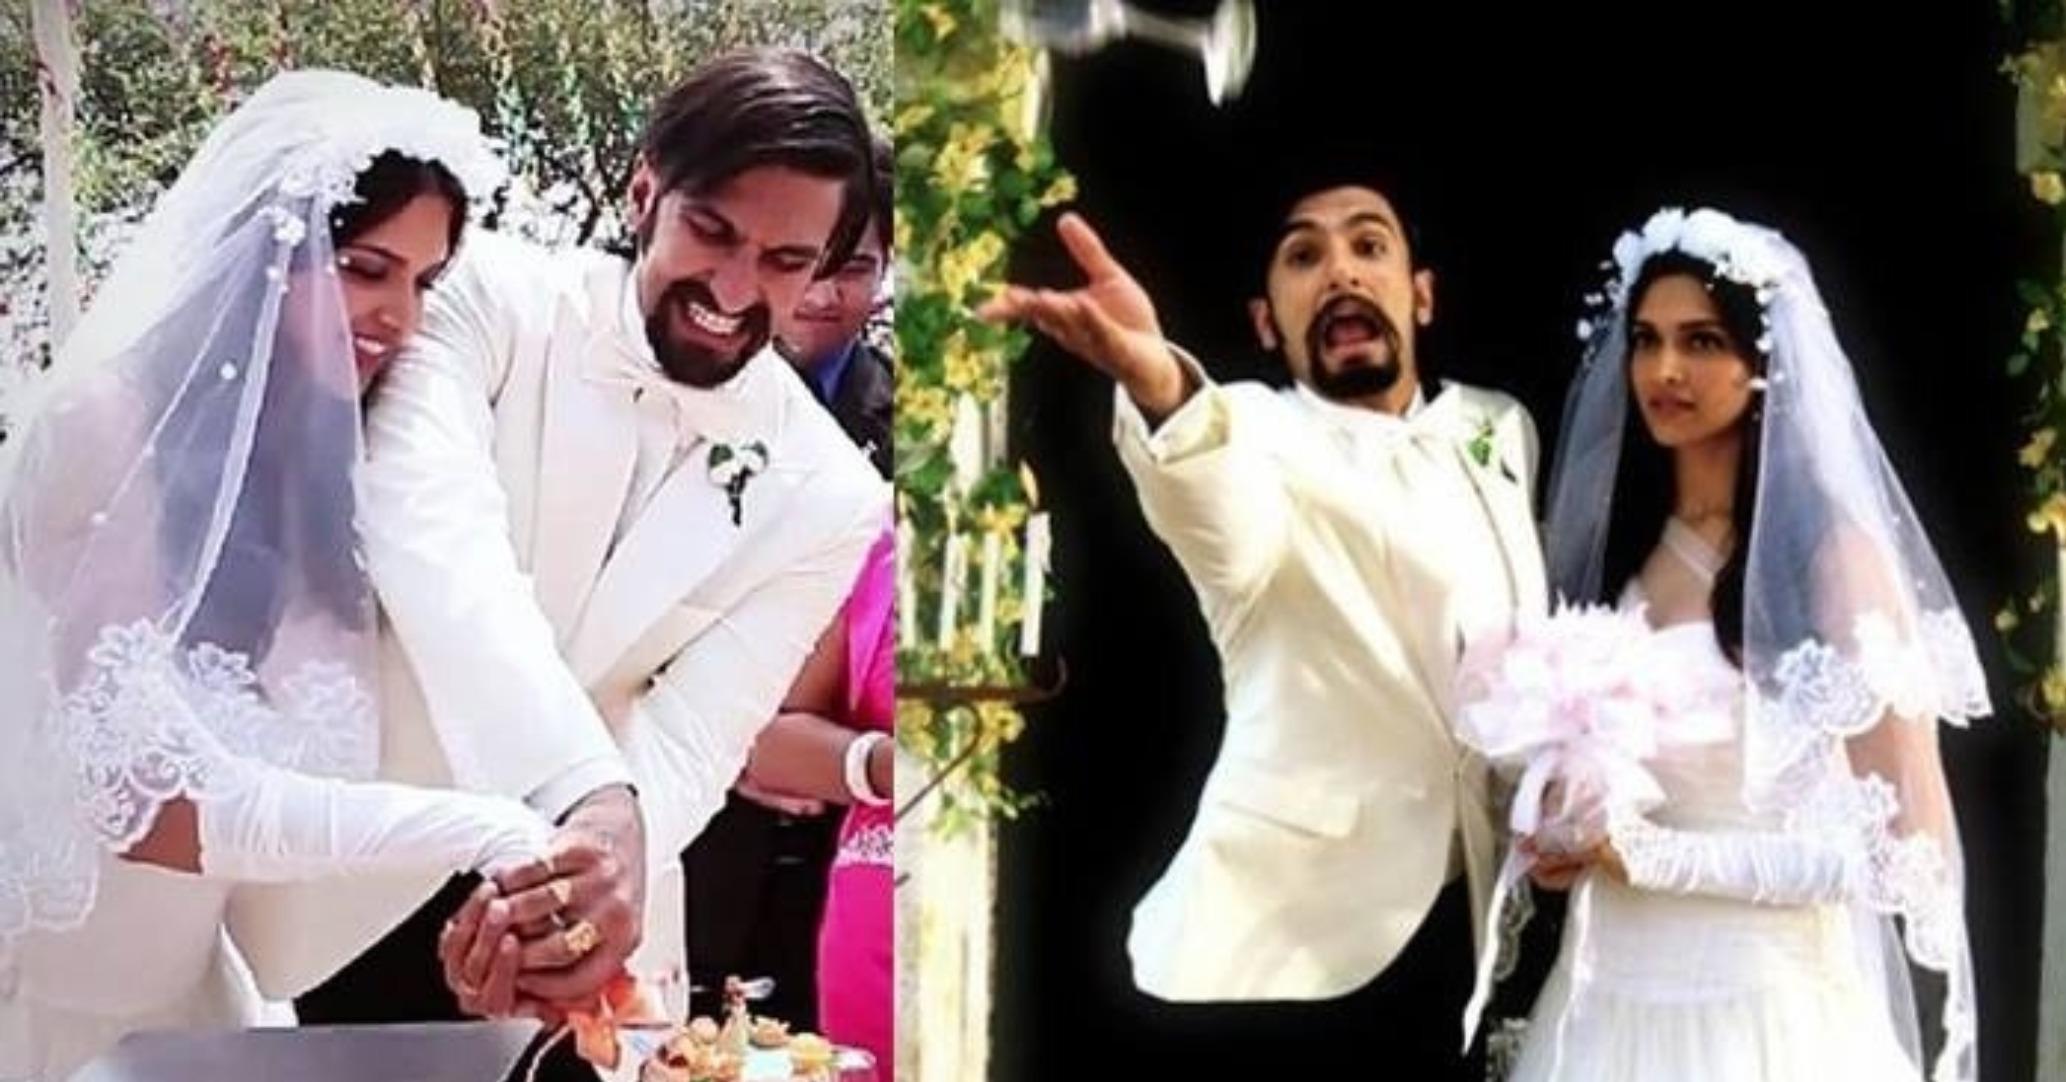 B-Town Hotties Ranveer-Deepika to Finally Tie Nuptial Knots!